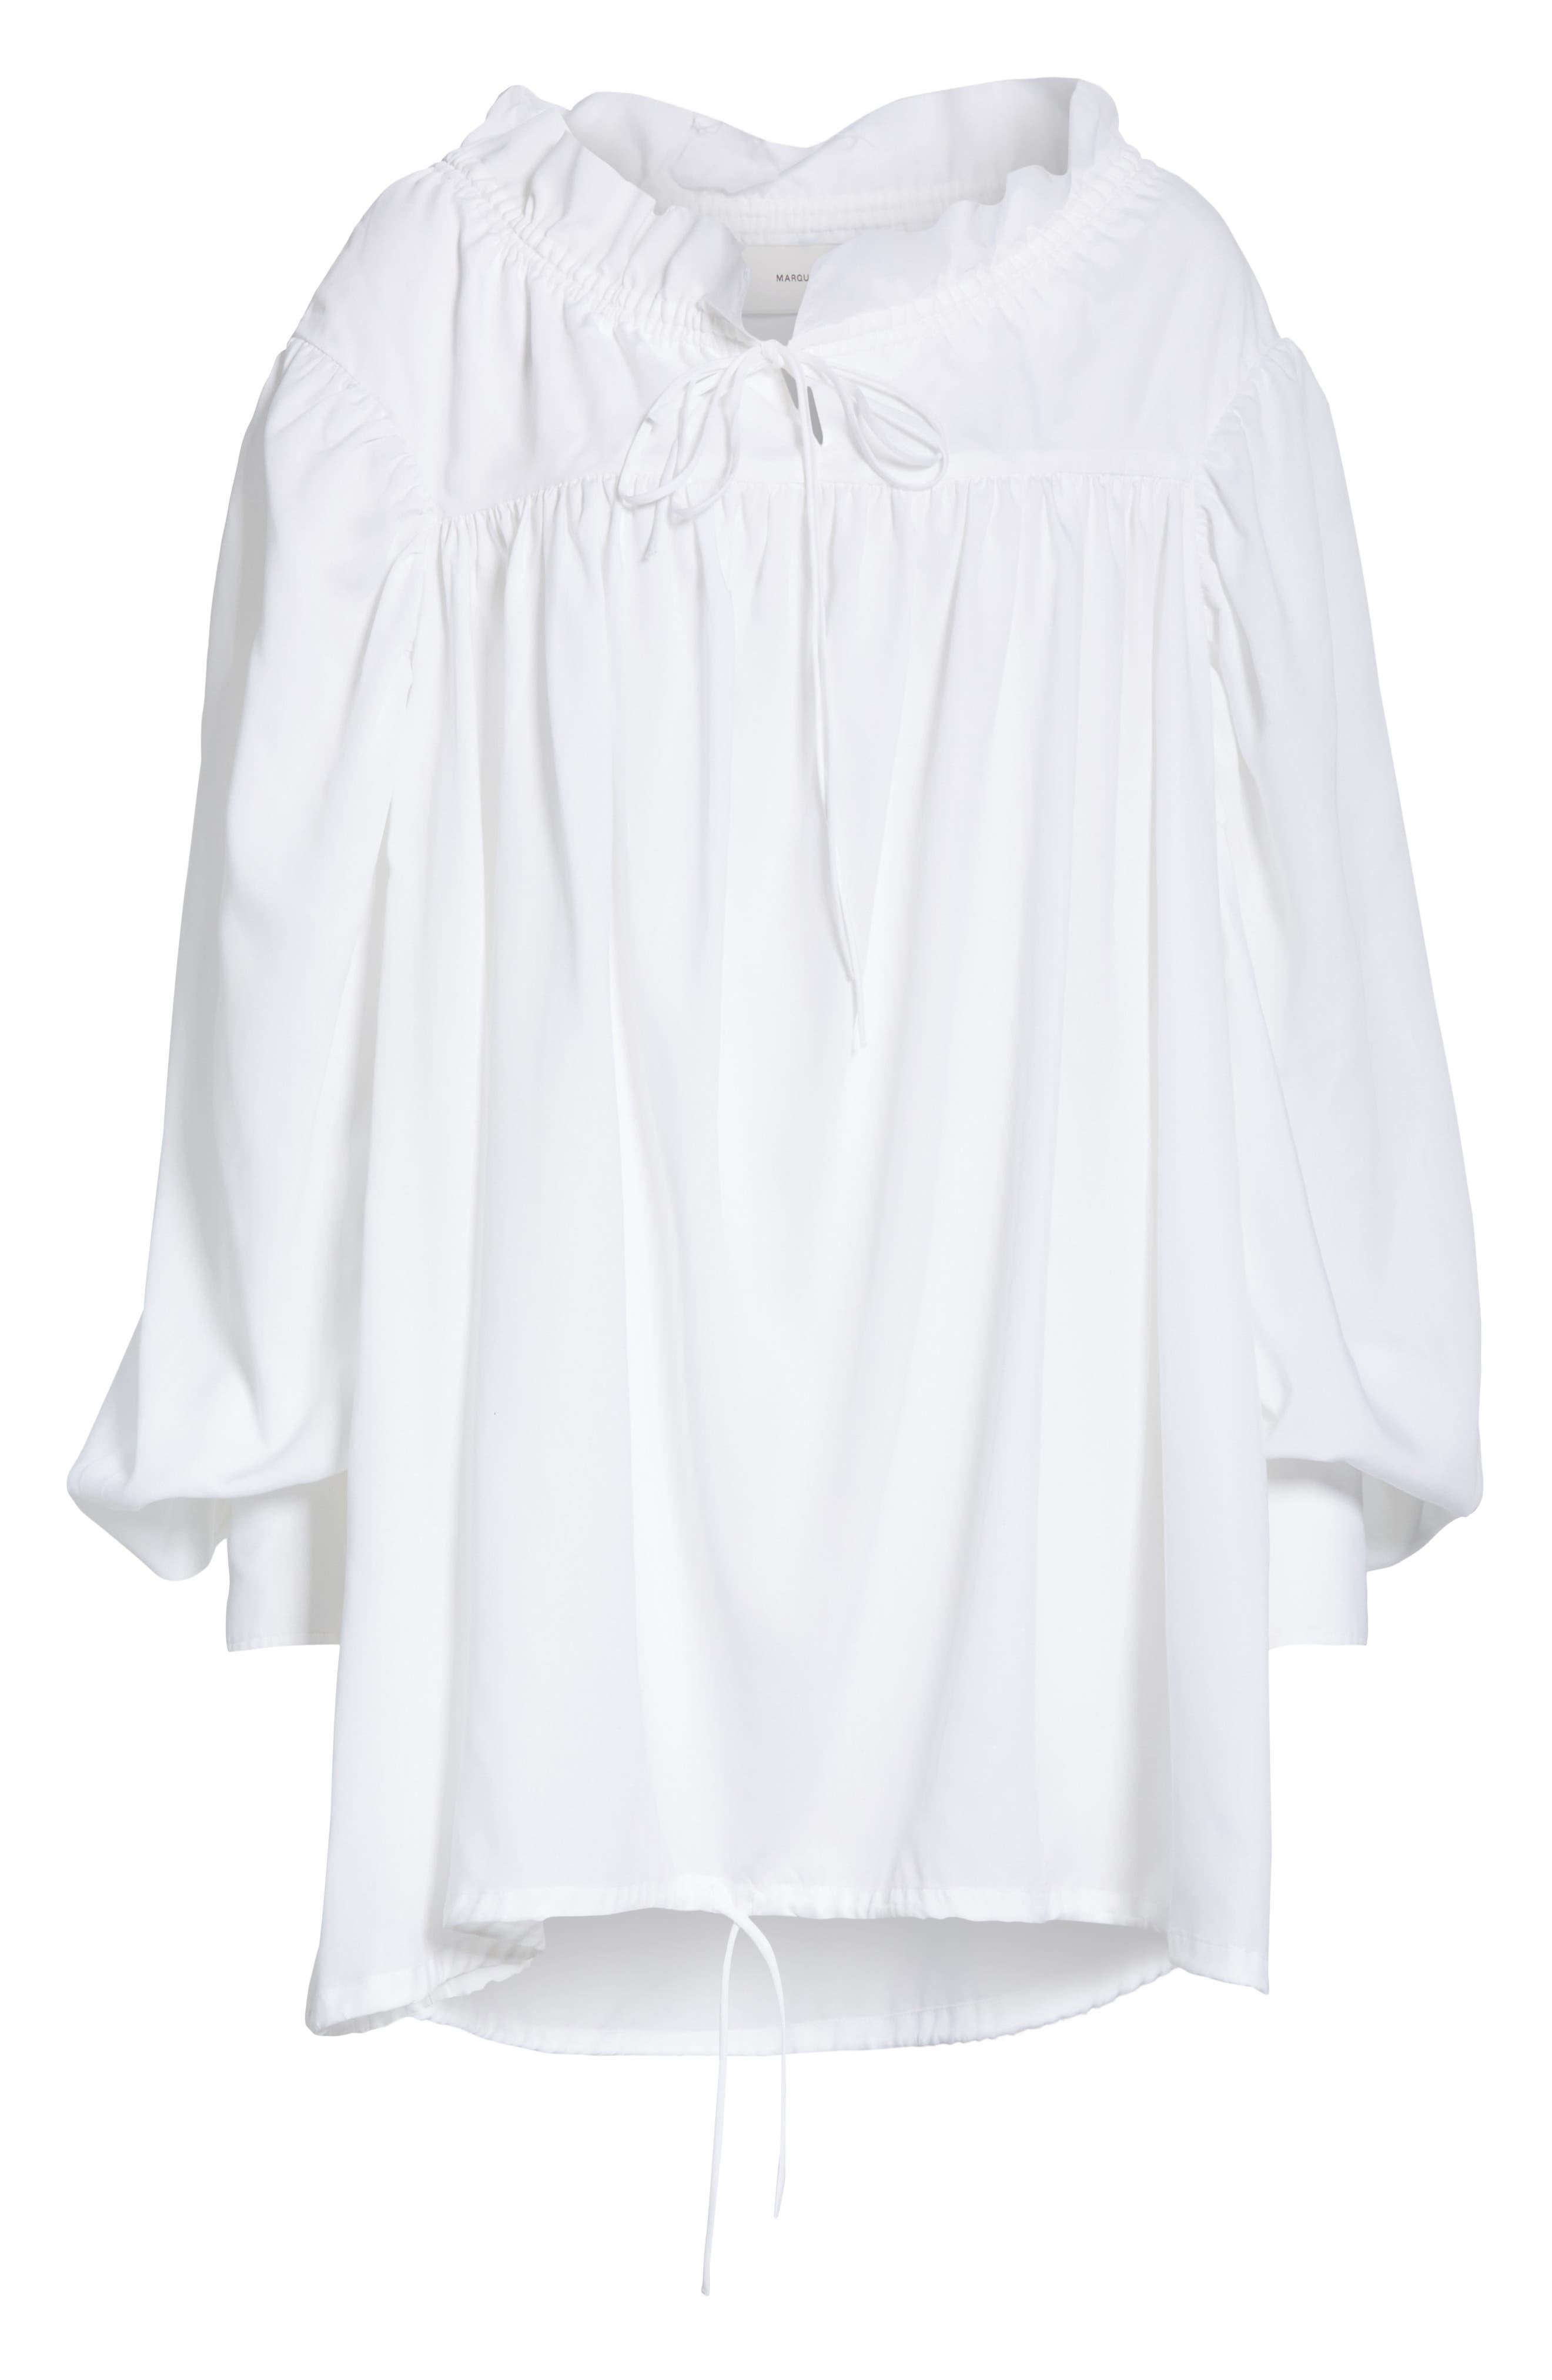 Marques'Almeida Gathered Yoke Shirt,                             Alternate thumbnail 6, color,                             WHITE